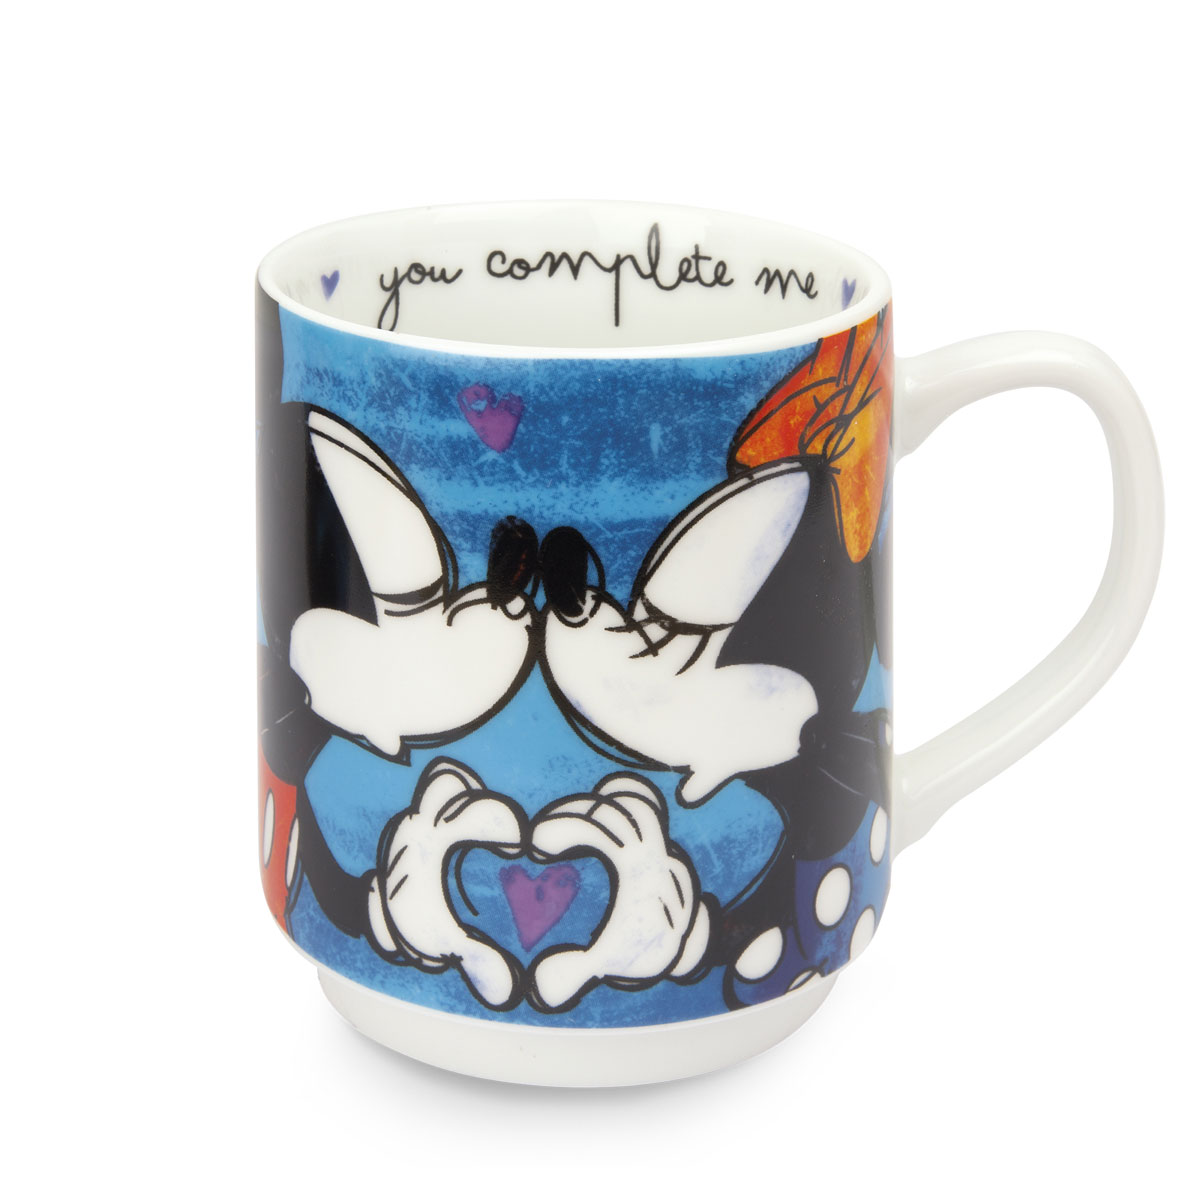 Stackable Mug Blue Mickey Mouse - Disney Home